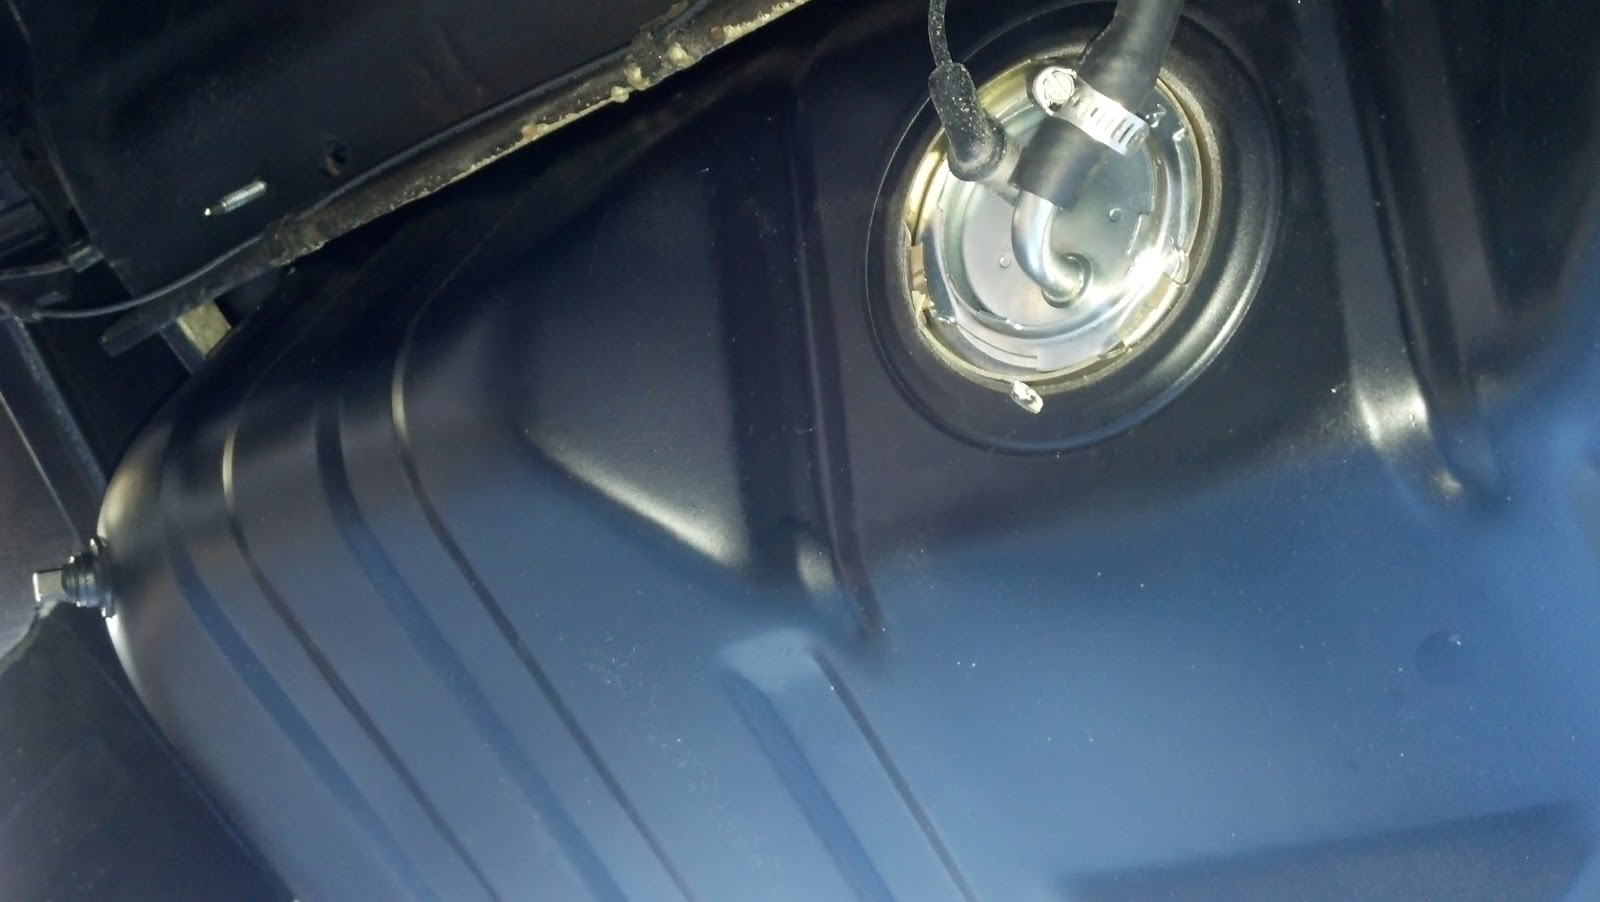 LeLu\'s 66 Mustang: Gauge Lights and Wiring